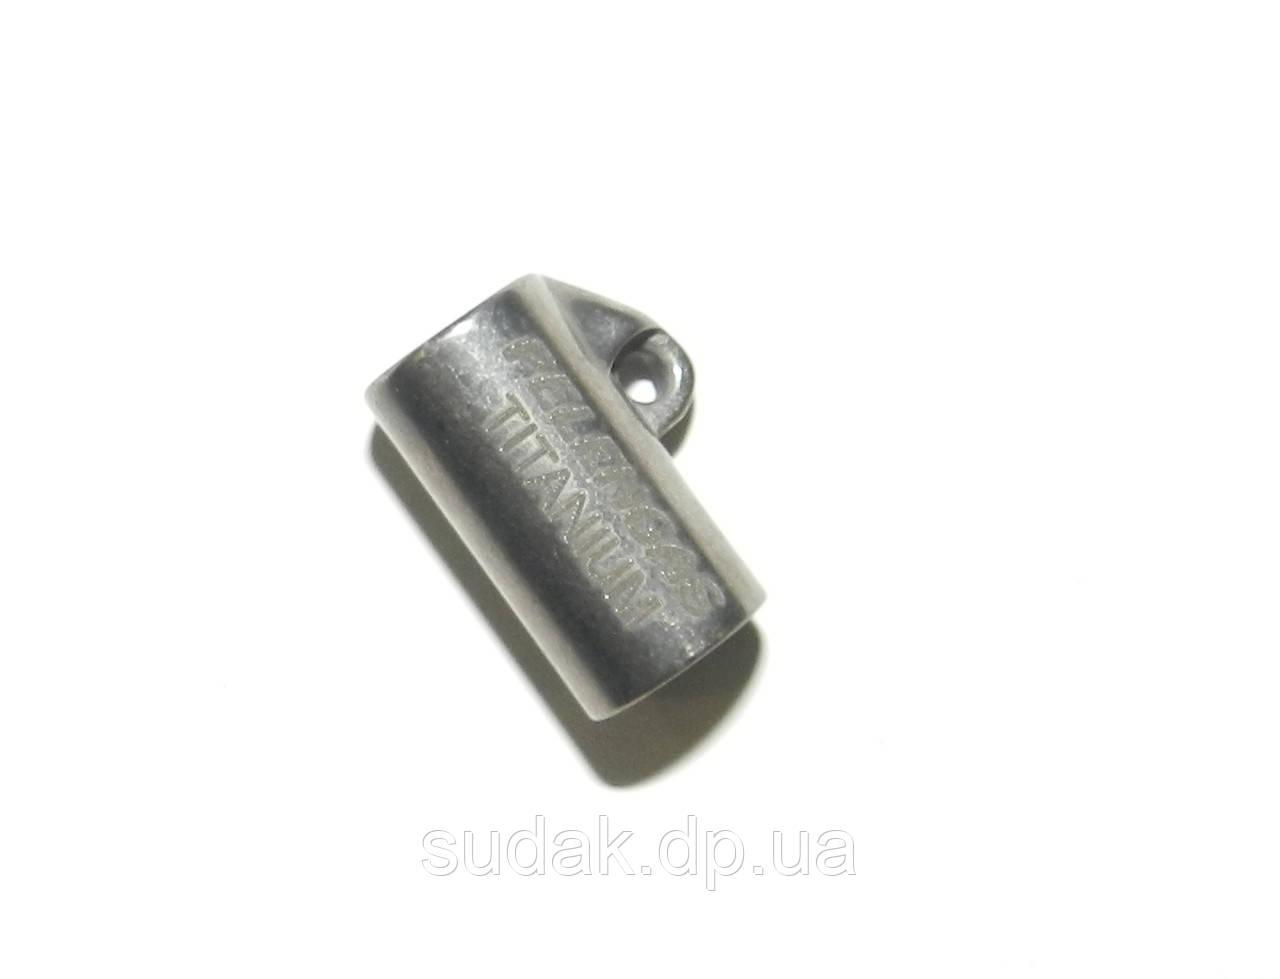 PELENGAS Скользящая втулка Titanium с гидротормозом 7 мм